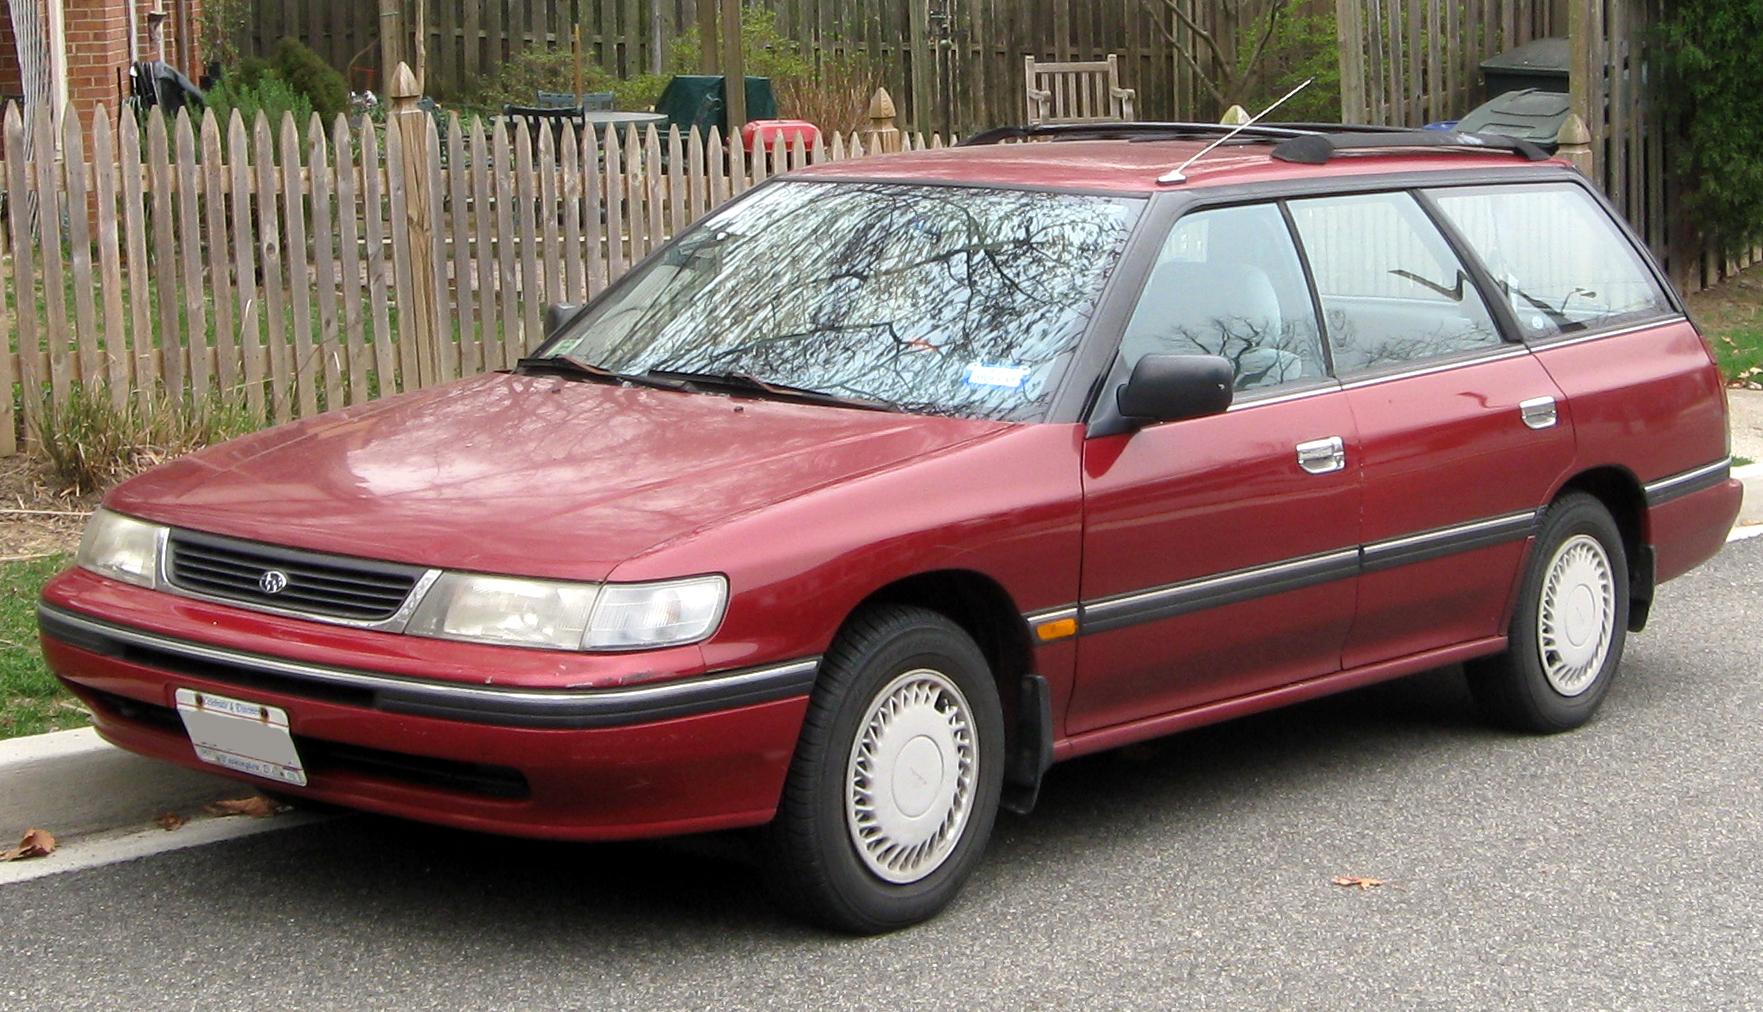 File:1st Subaru Legacy wagon -- 03-16-2012 front.JPG - Wikimedia Commons